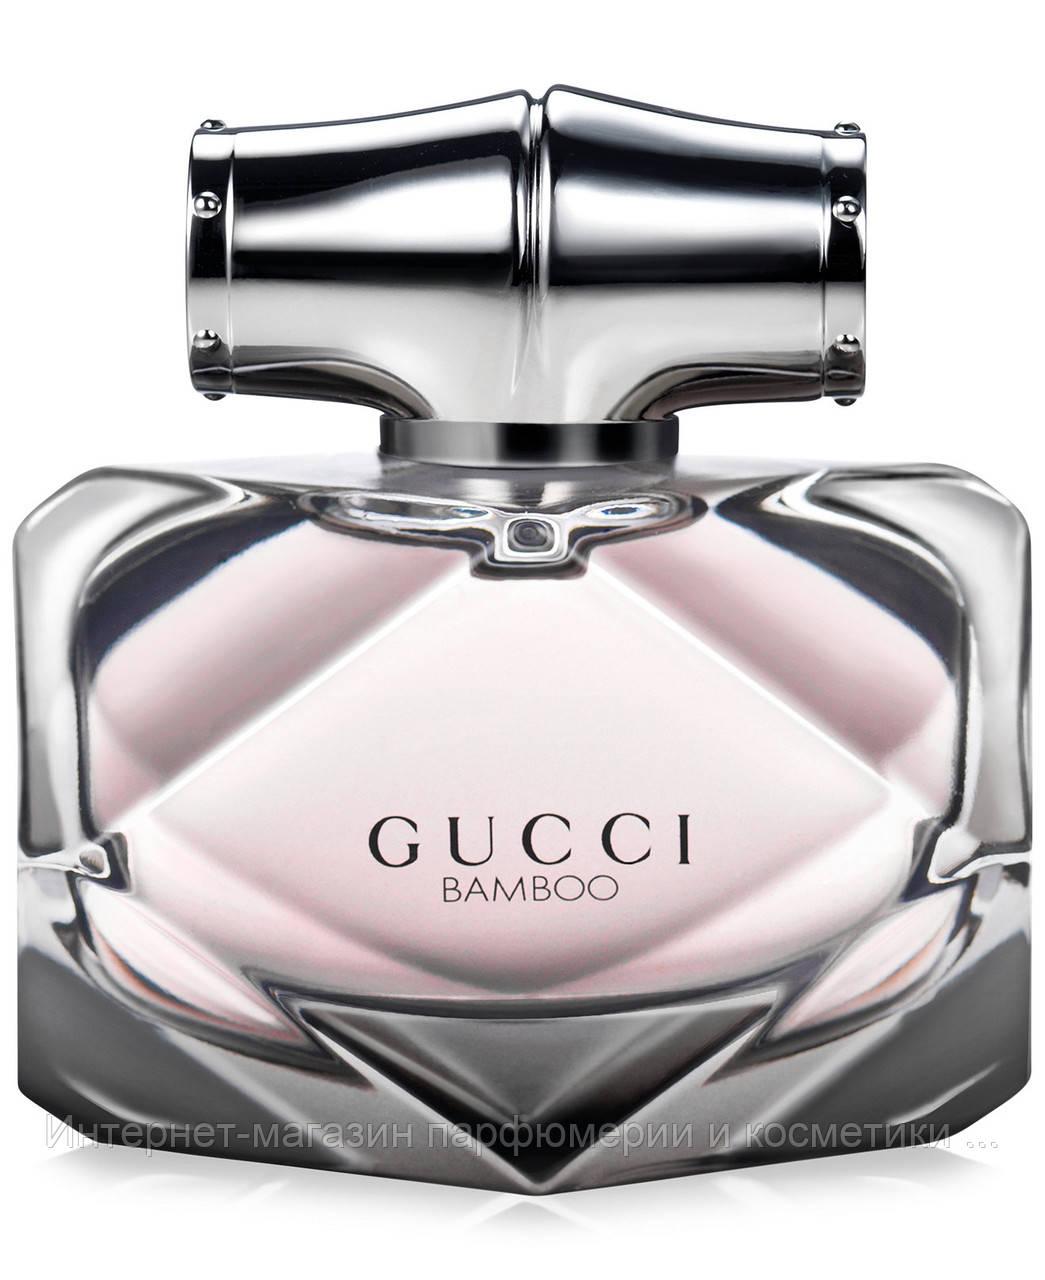 Gucci Bamboo edp 75 ml TESTER - Интернет-магазин парфюмерии и косметики  «Кладовая Ароматов fdad128be5e58